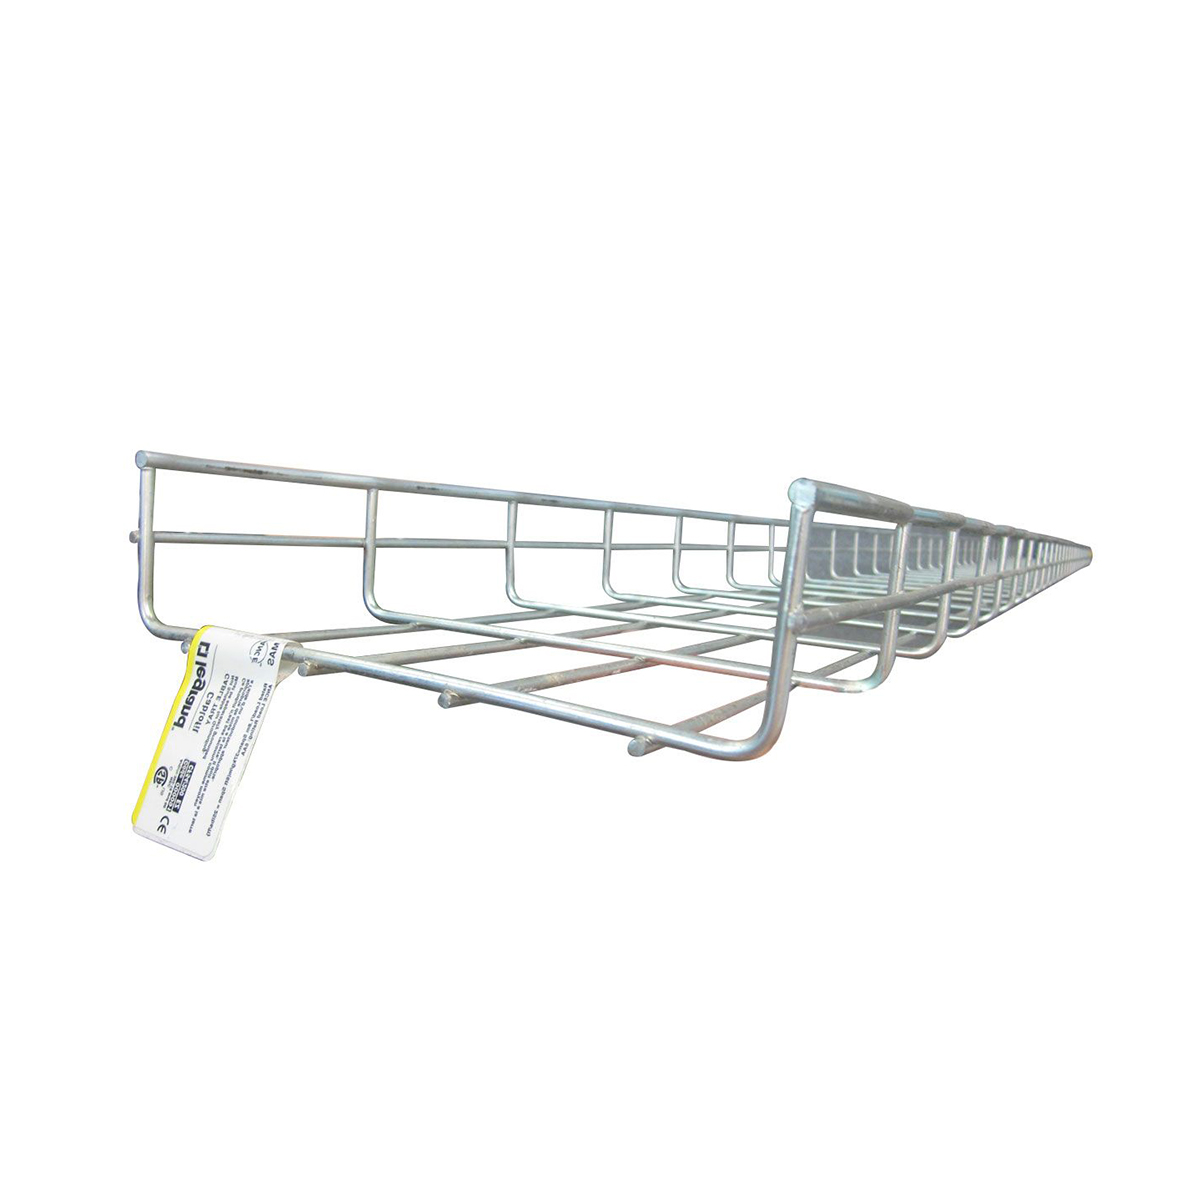 Bandeja porta cable tipo escalerilla galvanizada 0.20 m x 3 m BTE003